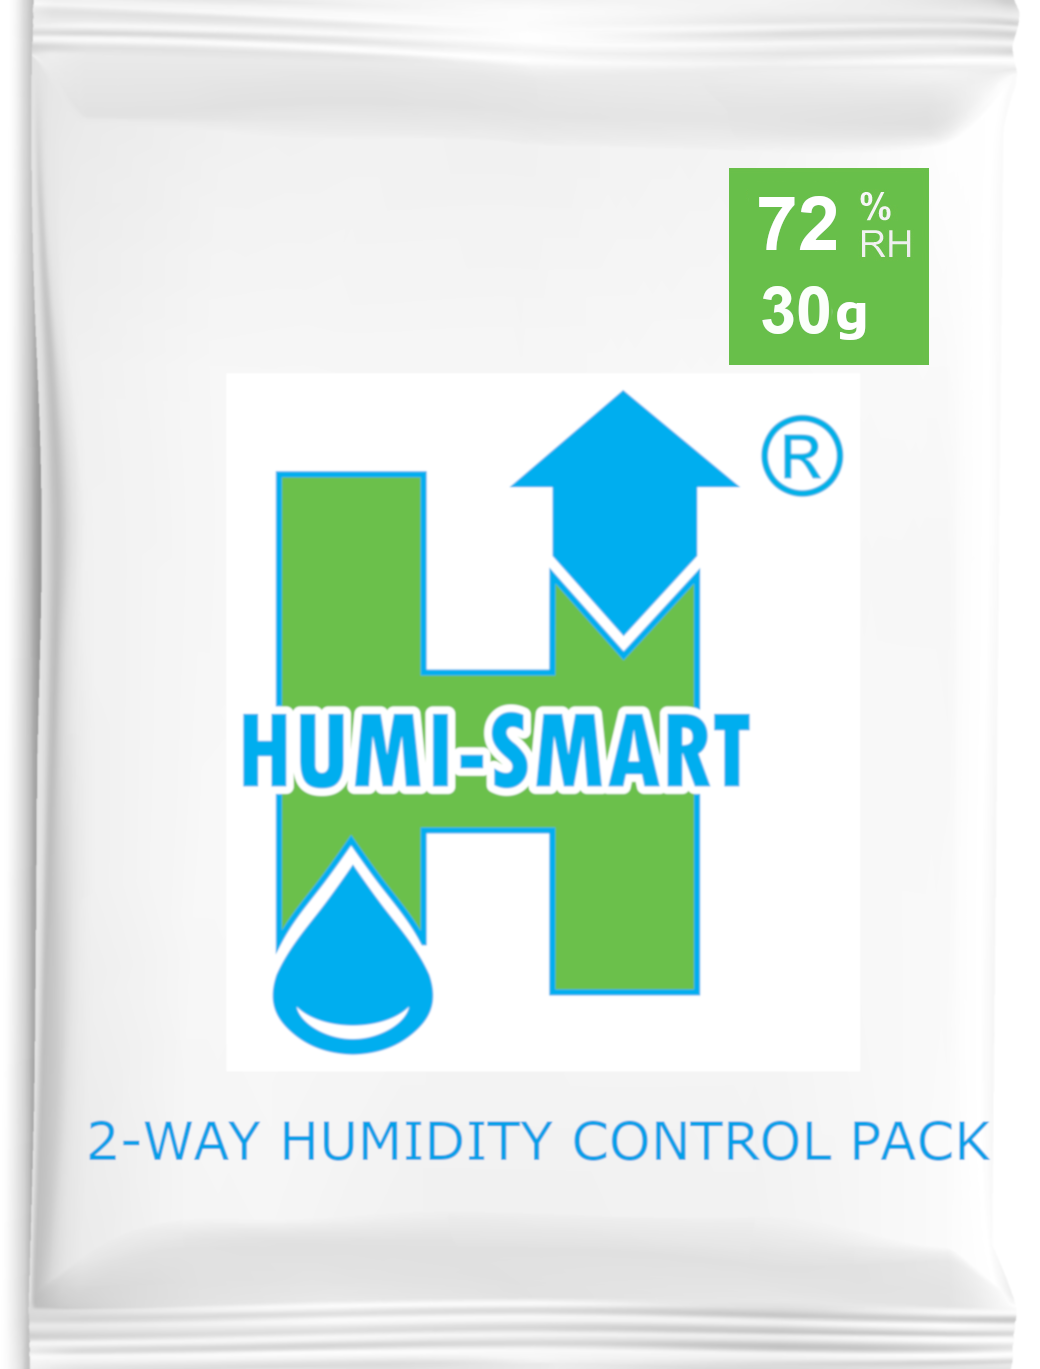 Humi Smart 30G 4 Foil Pack 72%